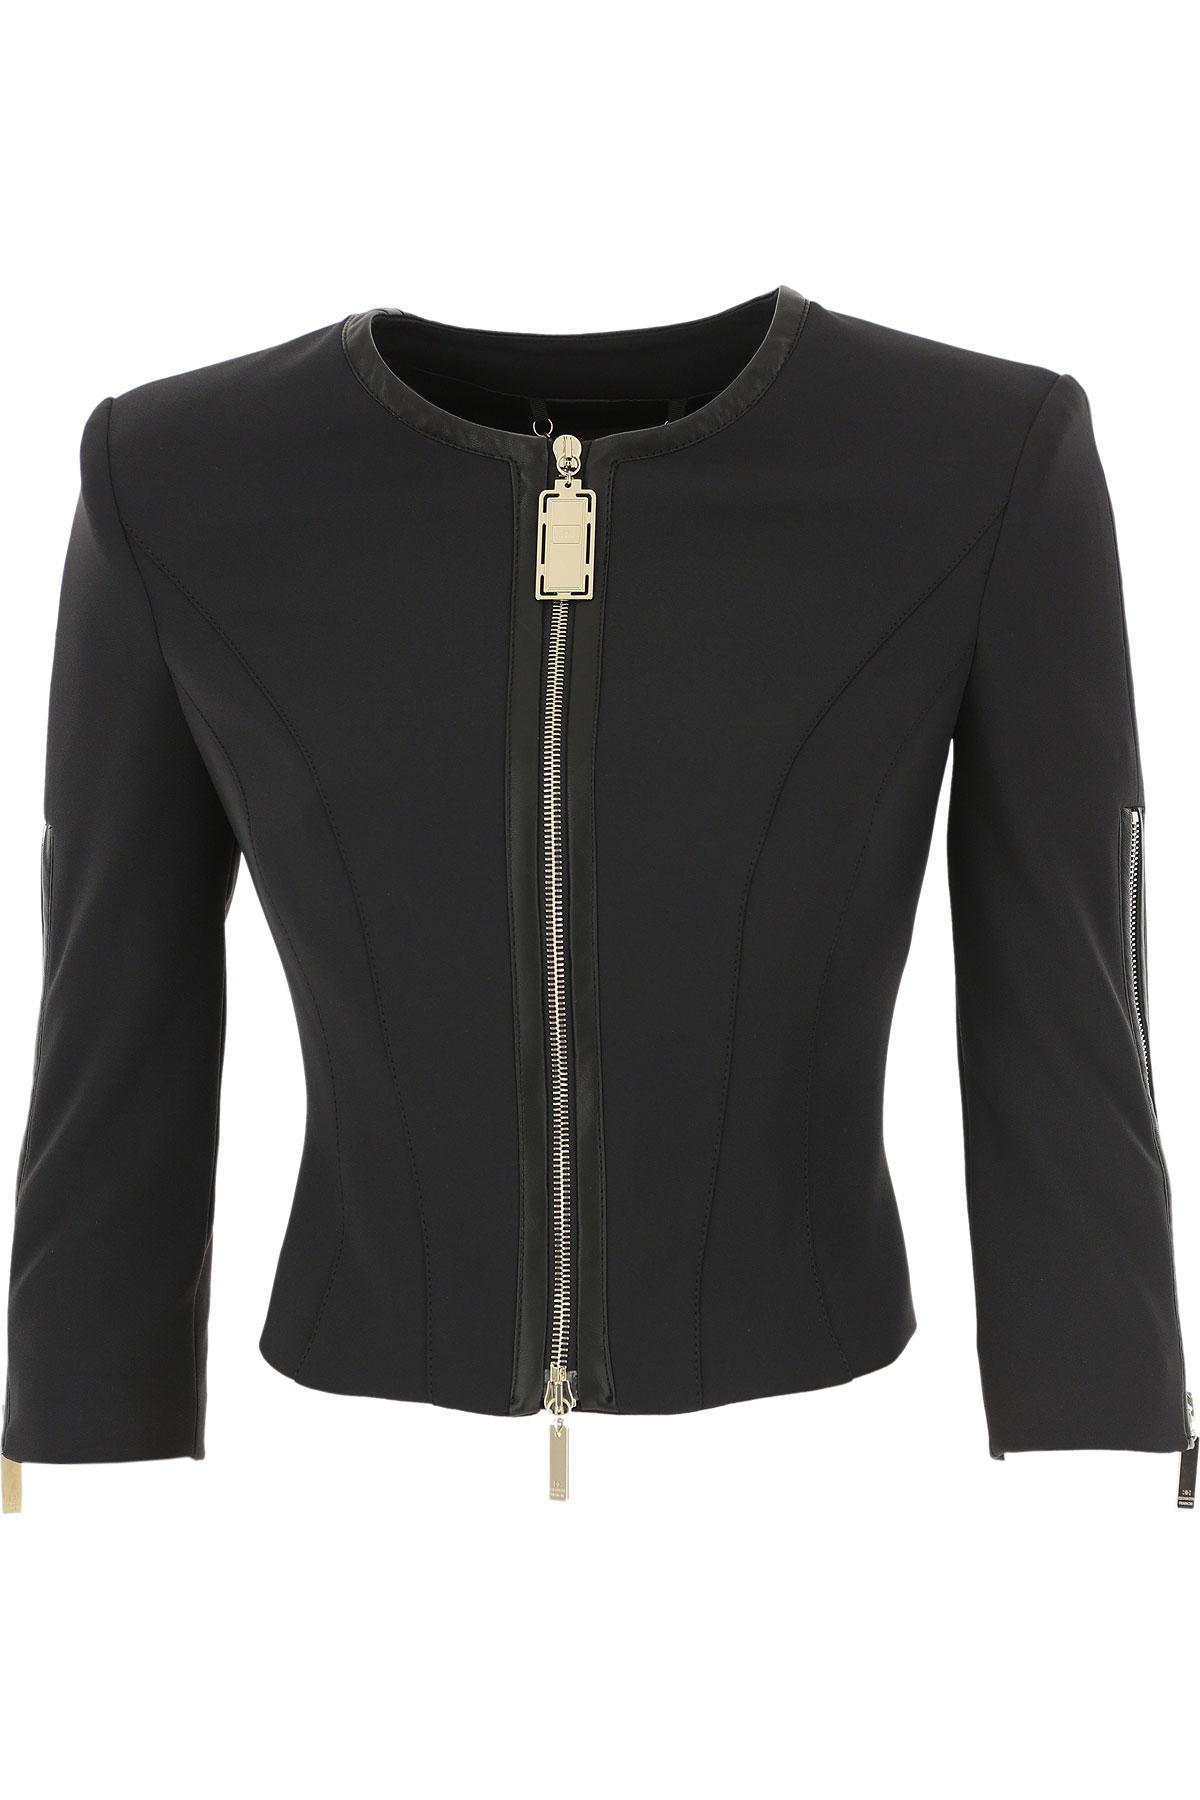 Elisabetta Franchi Blazer for Women On Sale, Black, polyestere, 2019, 4 6